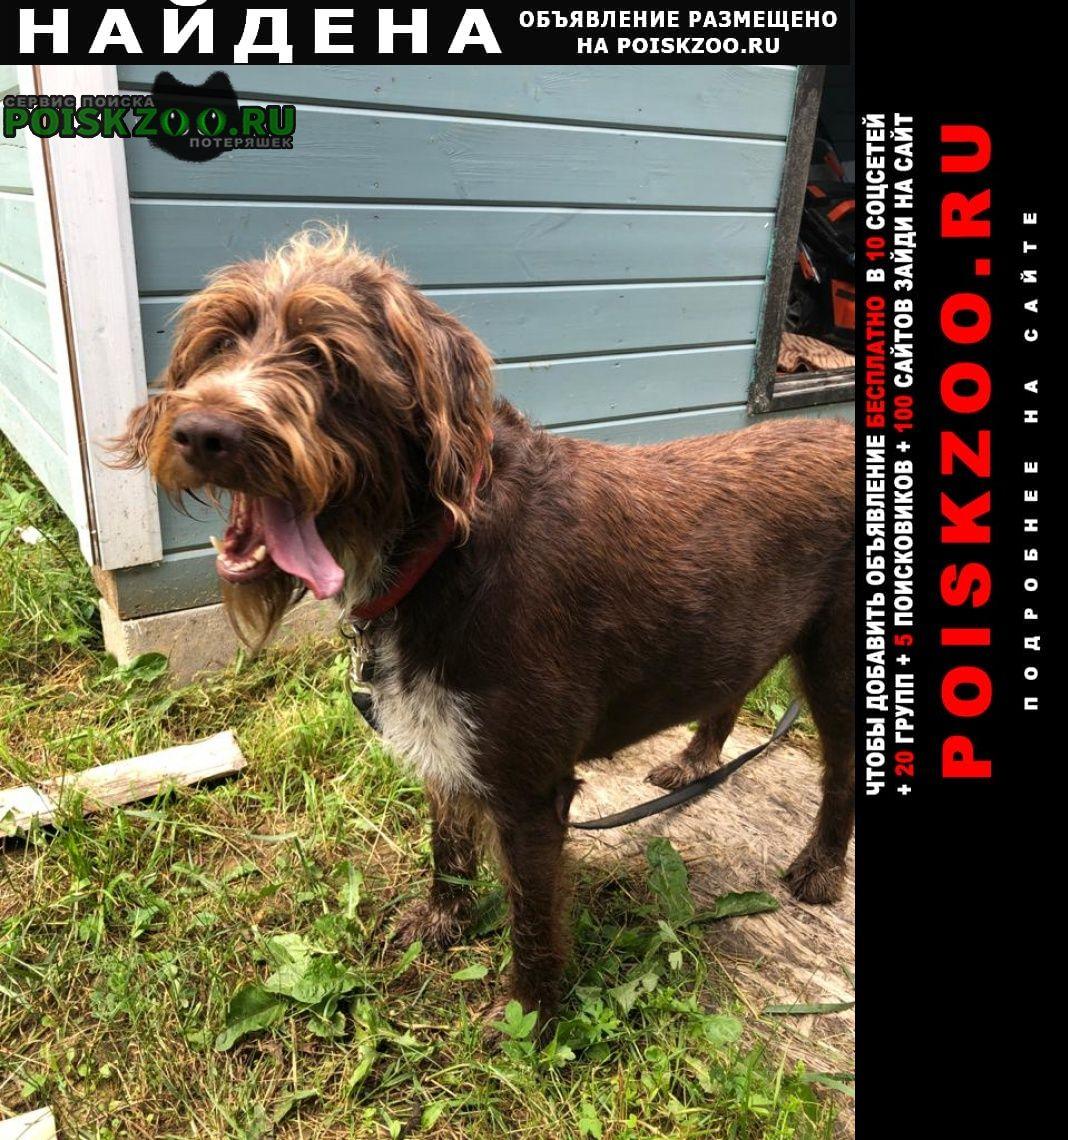 Найдена собака дратхаар Заокский